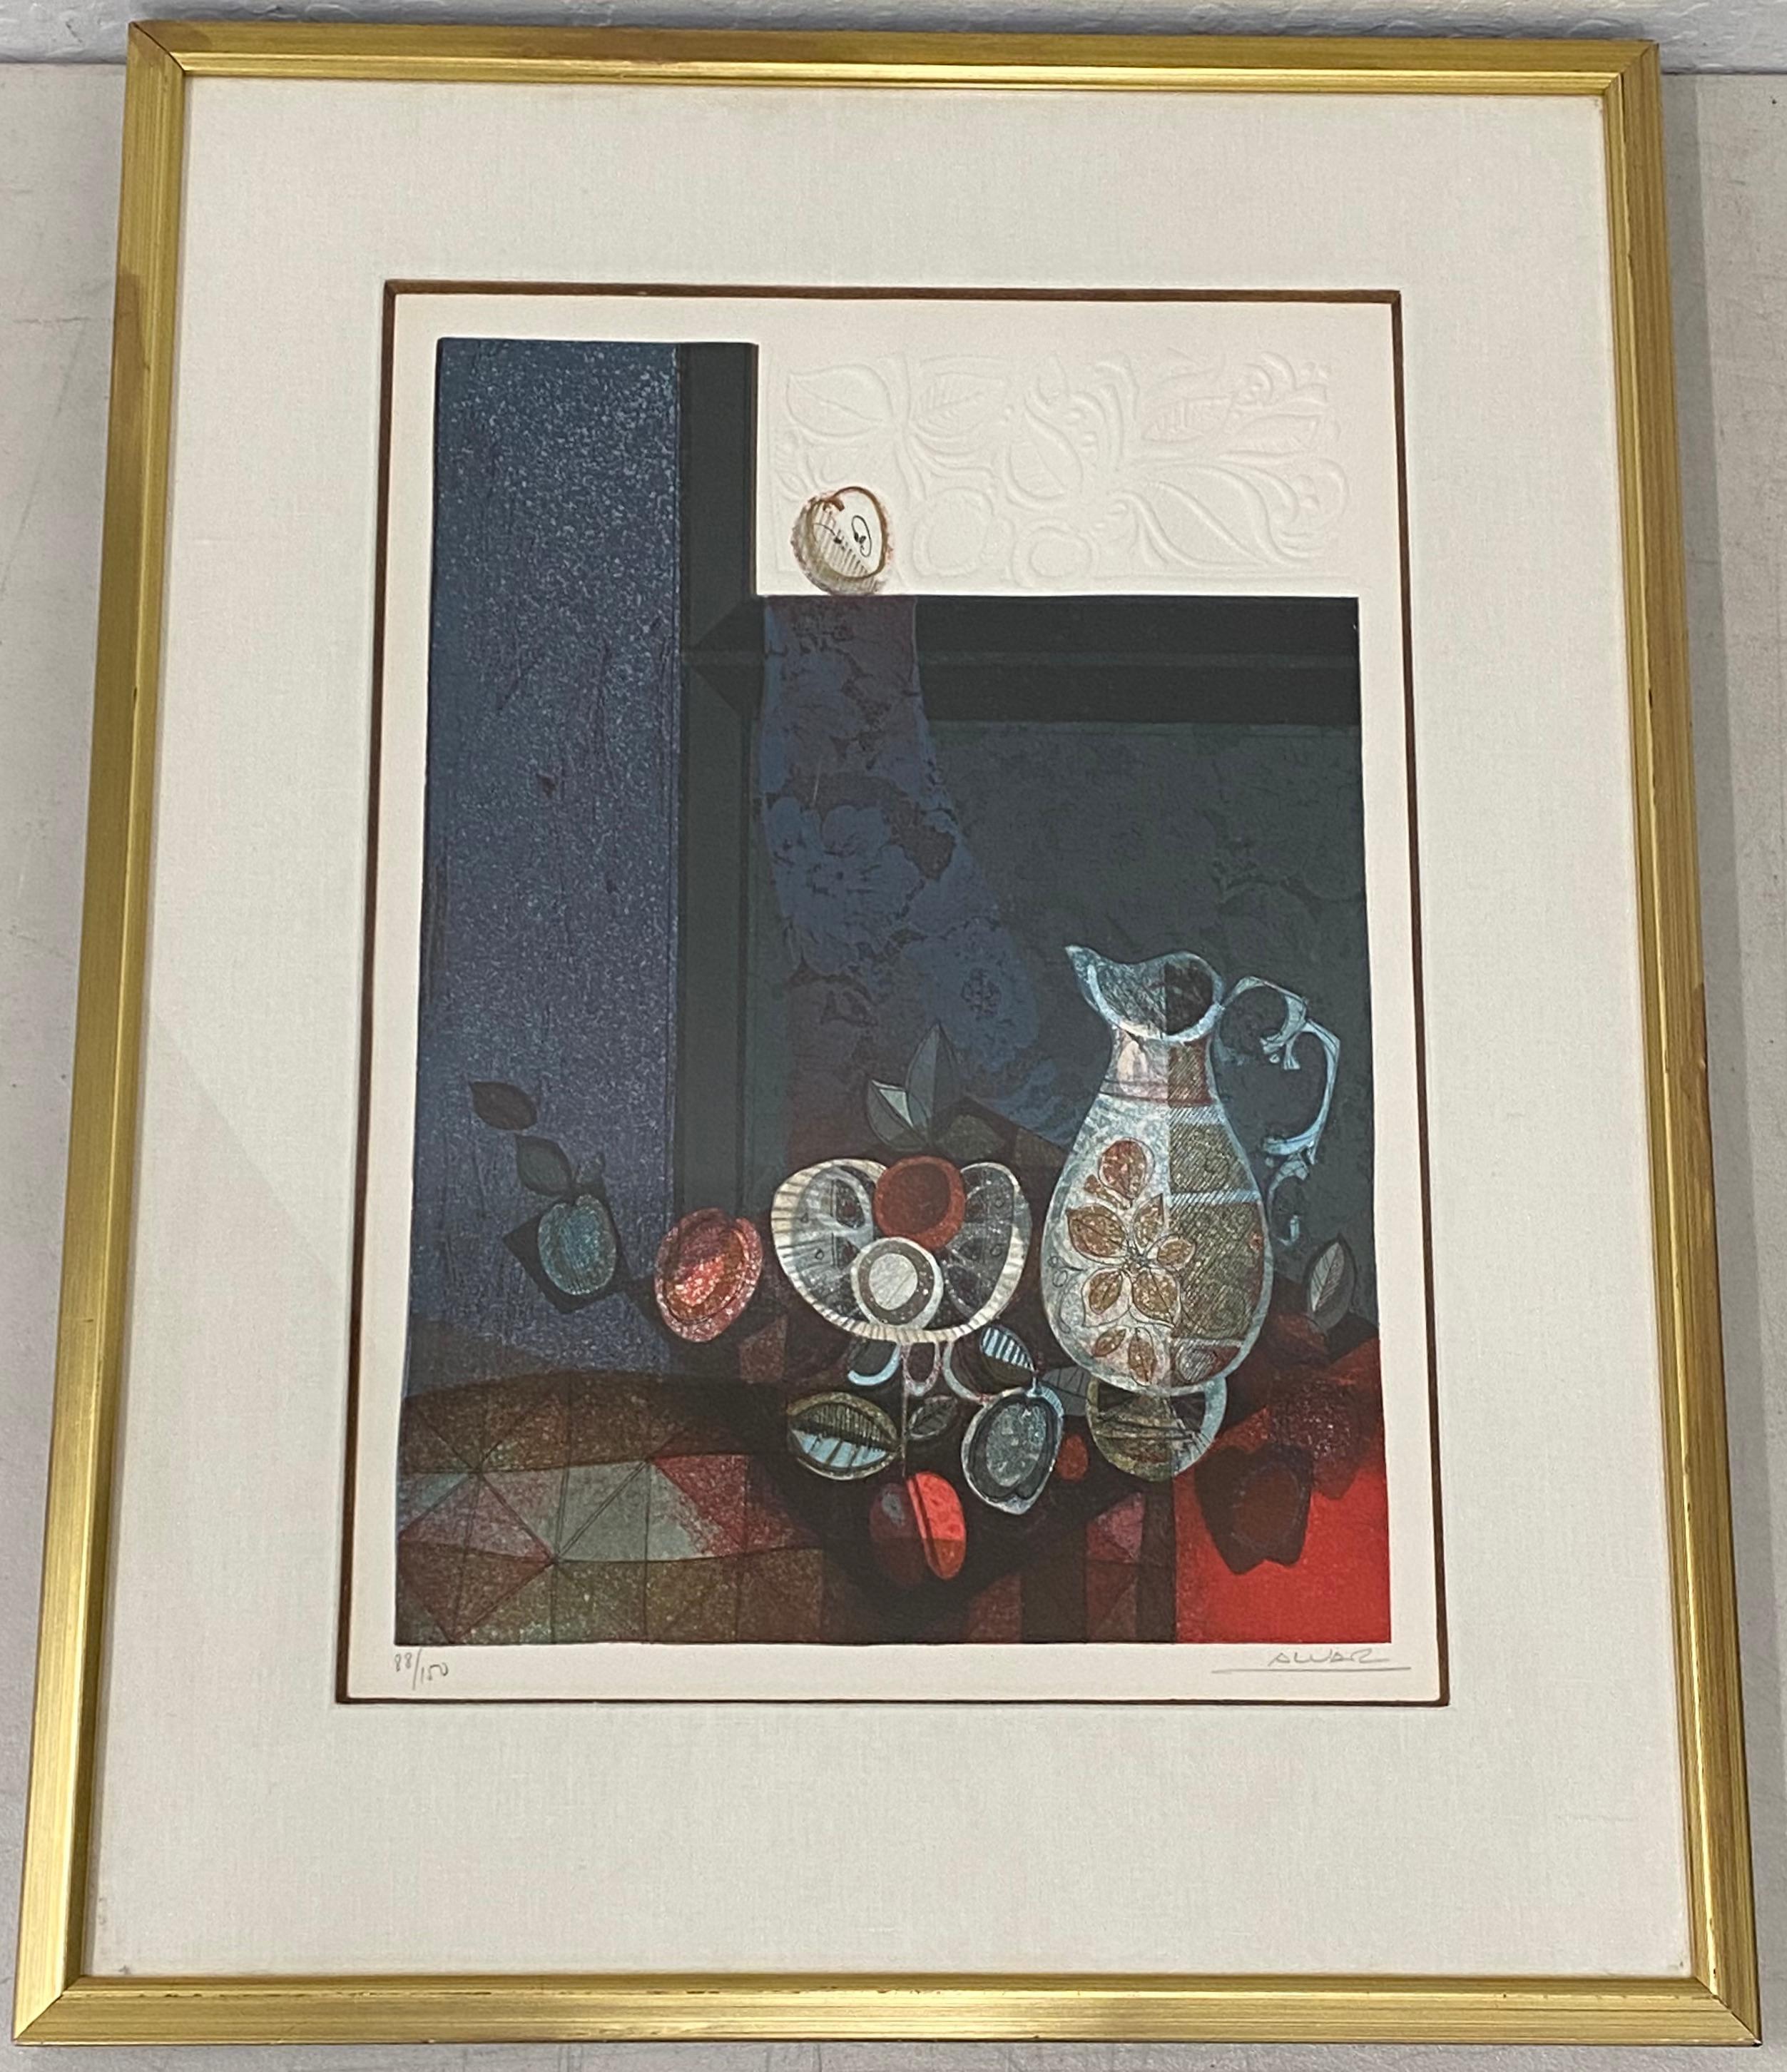 Alvar Sunol Embossed Still Life Lithograph C.1970s